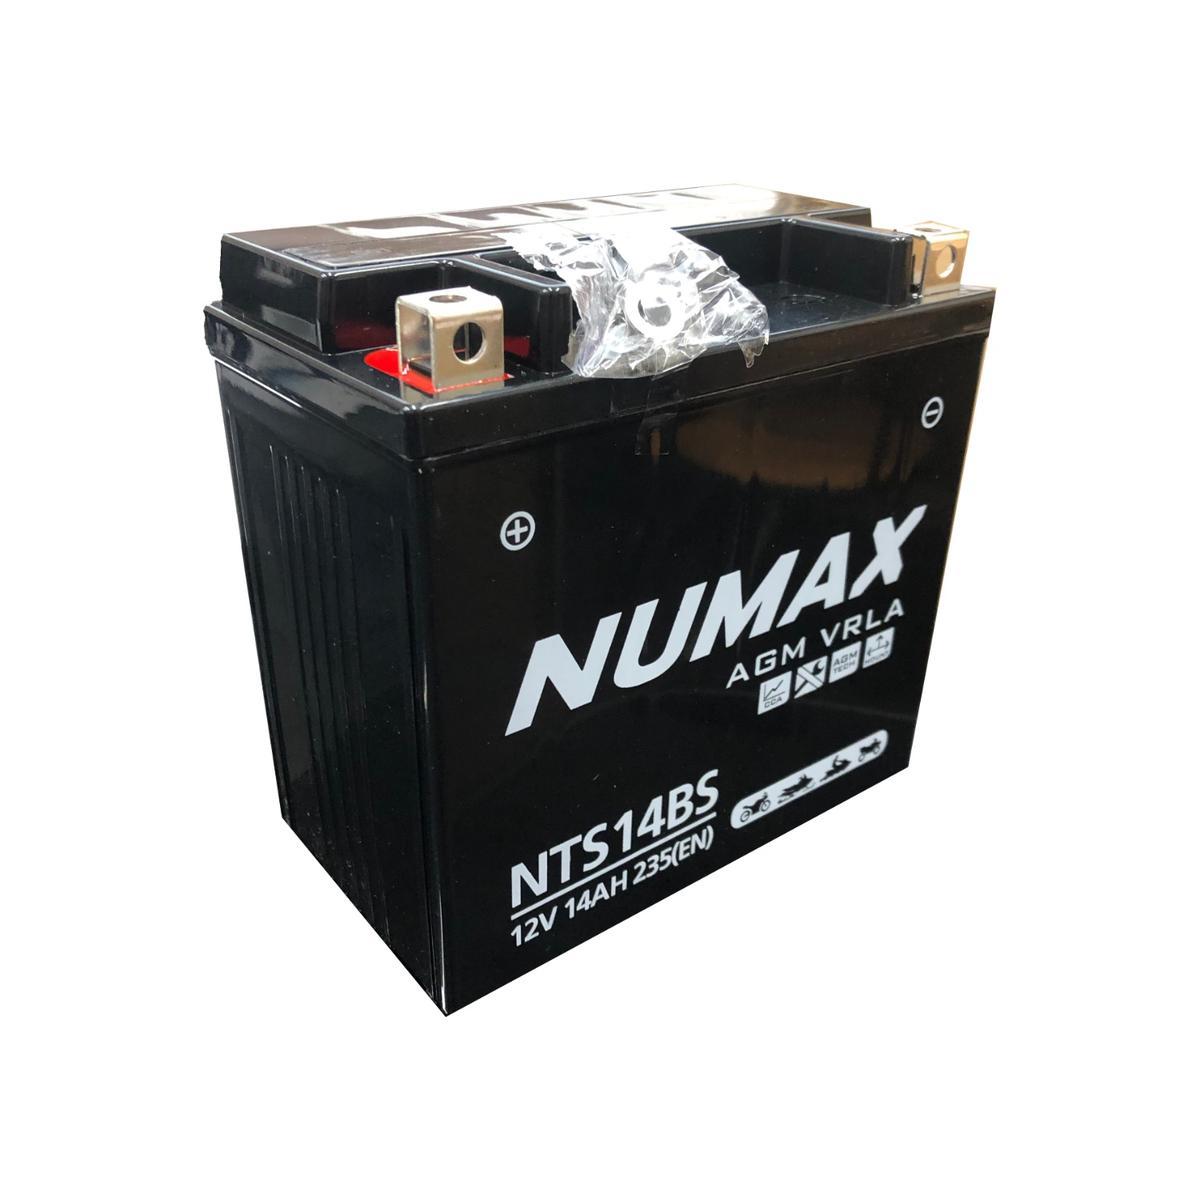 Numax NTS14BS 12v Motorbike Bike Battery KAWASAKI 650cc EJ650 YTX14-4